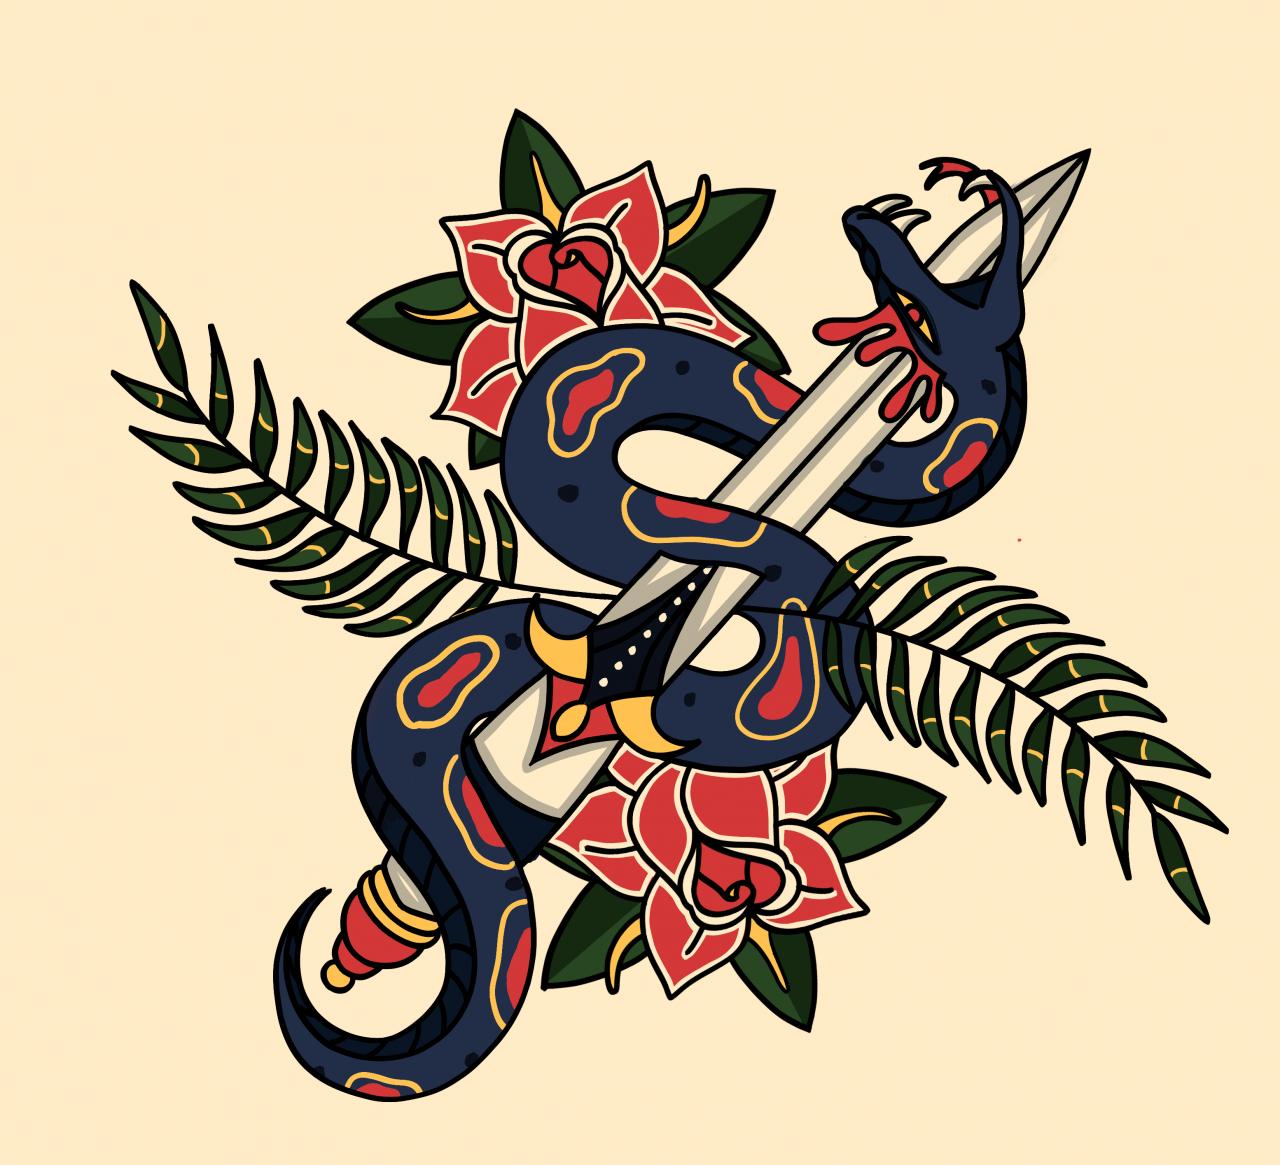 Americana-ish snake. criticism welcome ^_^